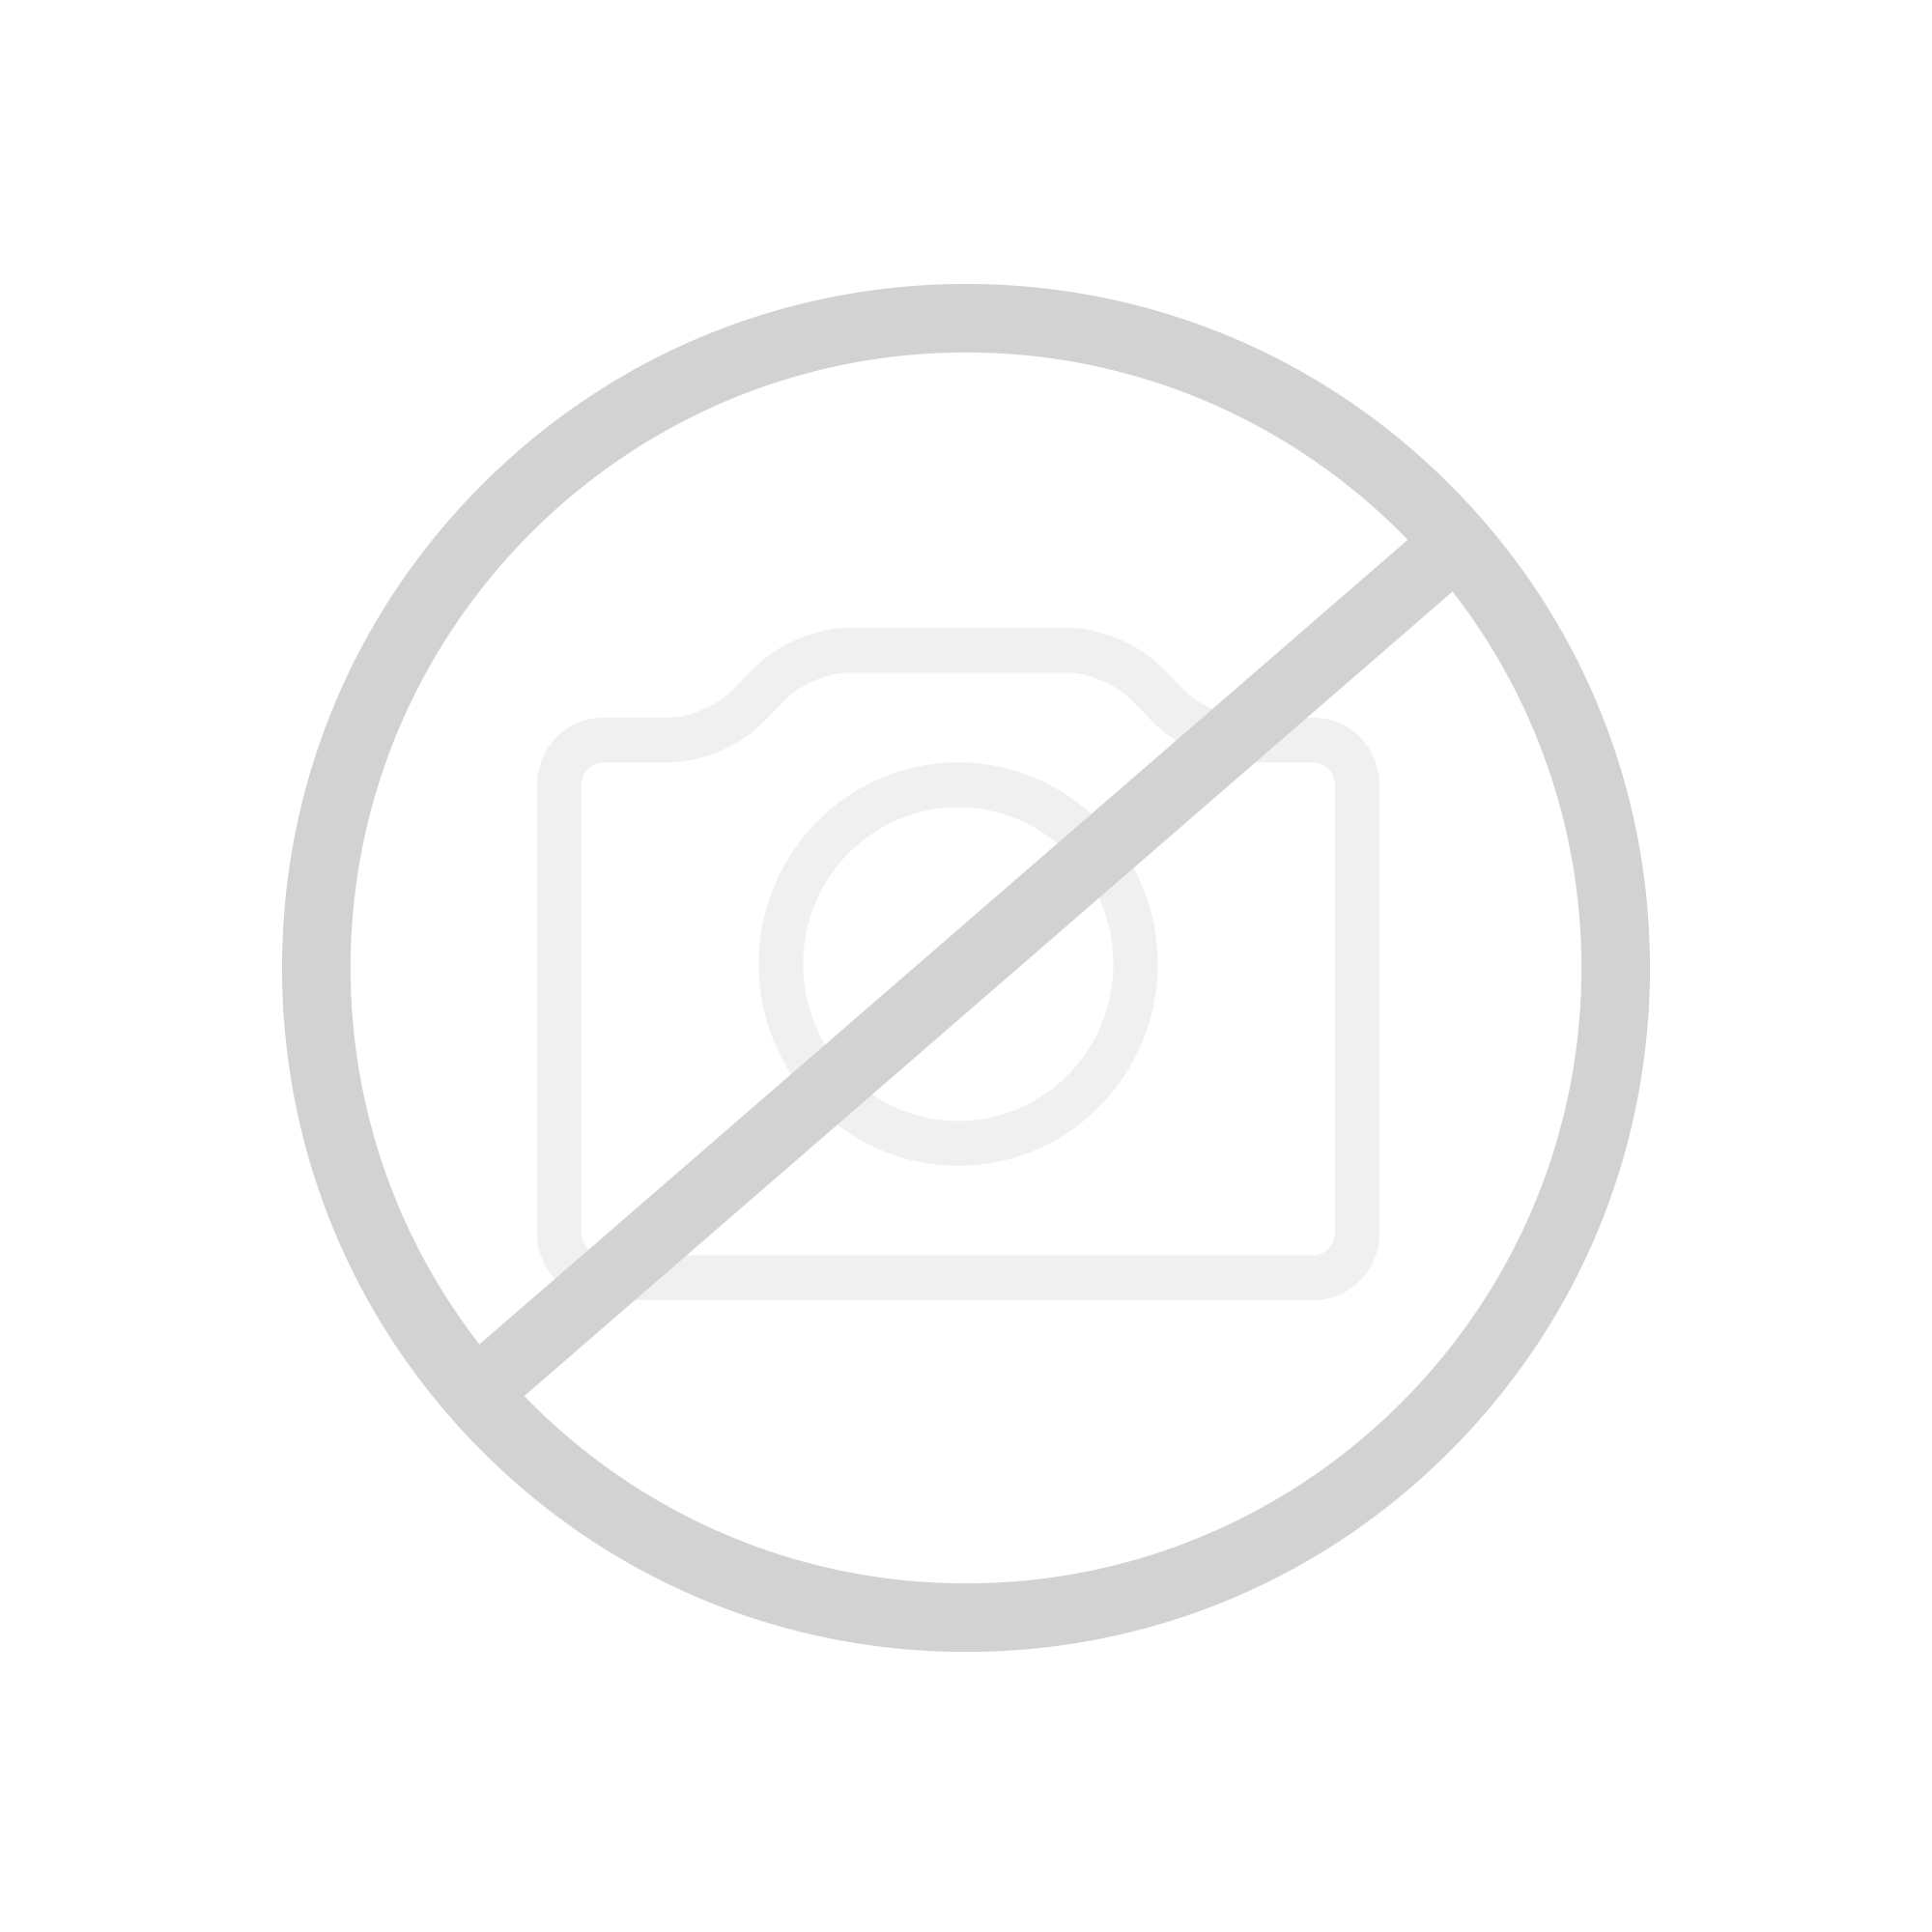 Badarmaturen hansgrohe  Hansgrohe Duscharmaturen und Wannenarmaturen bei REUTER